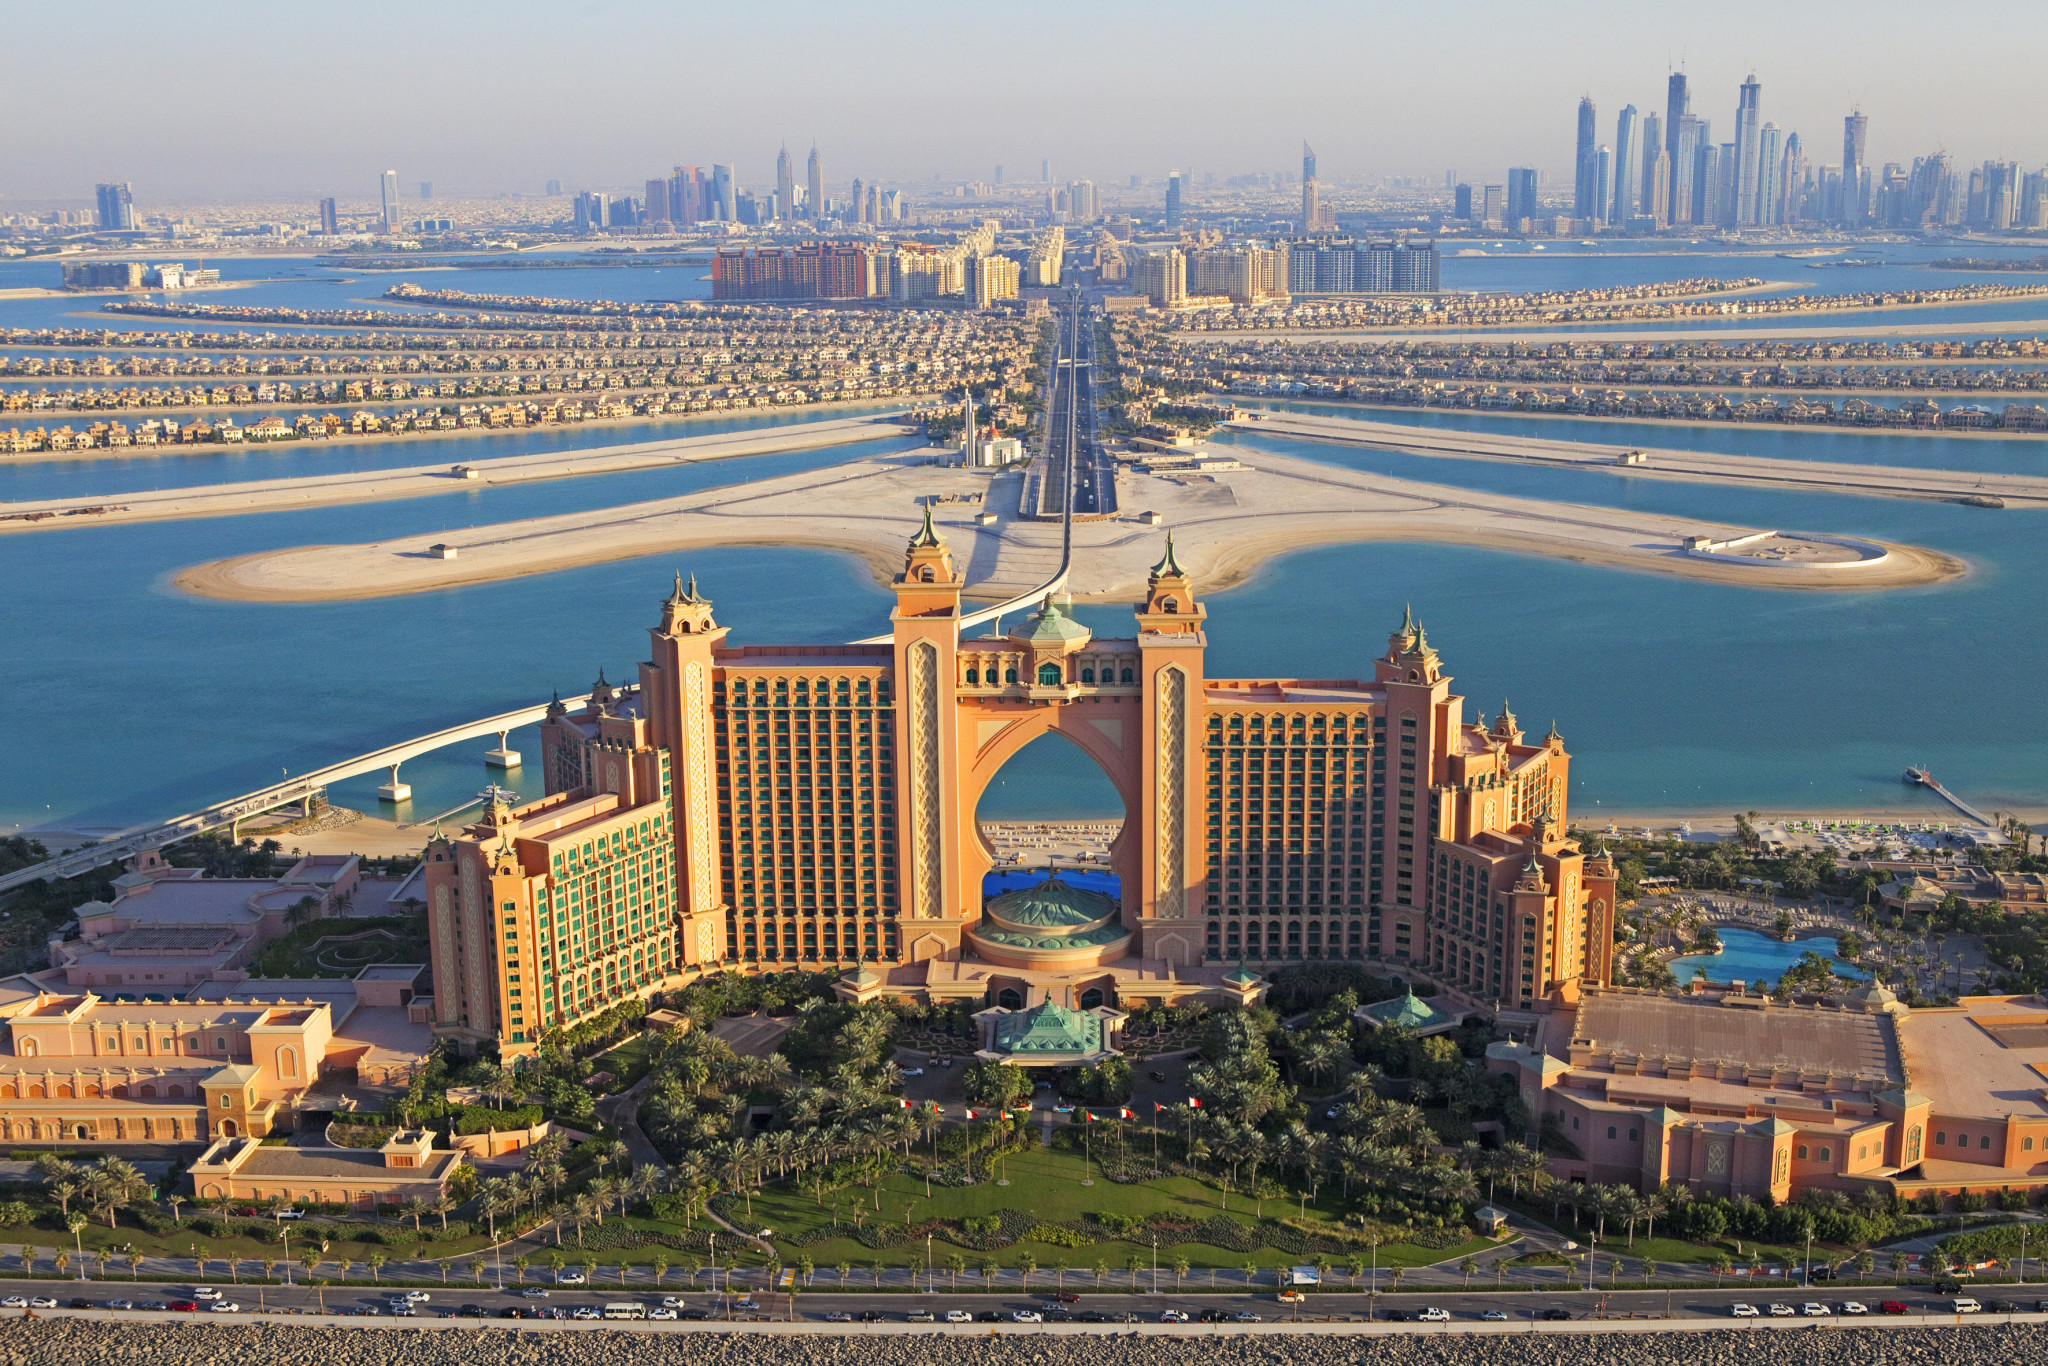 Аквапарк в Дубае «Aquaventure» отеля Atlantis the Palm